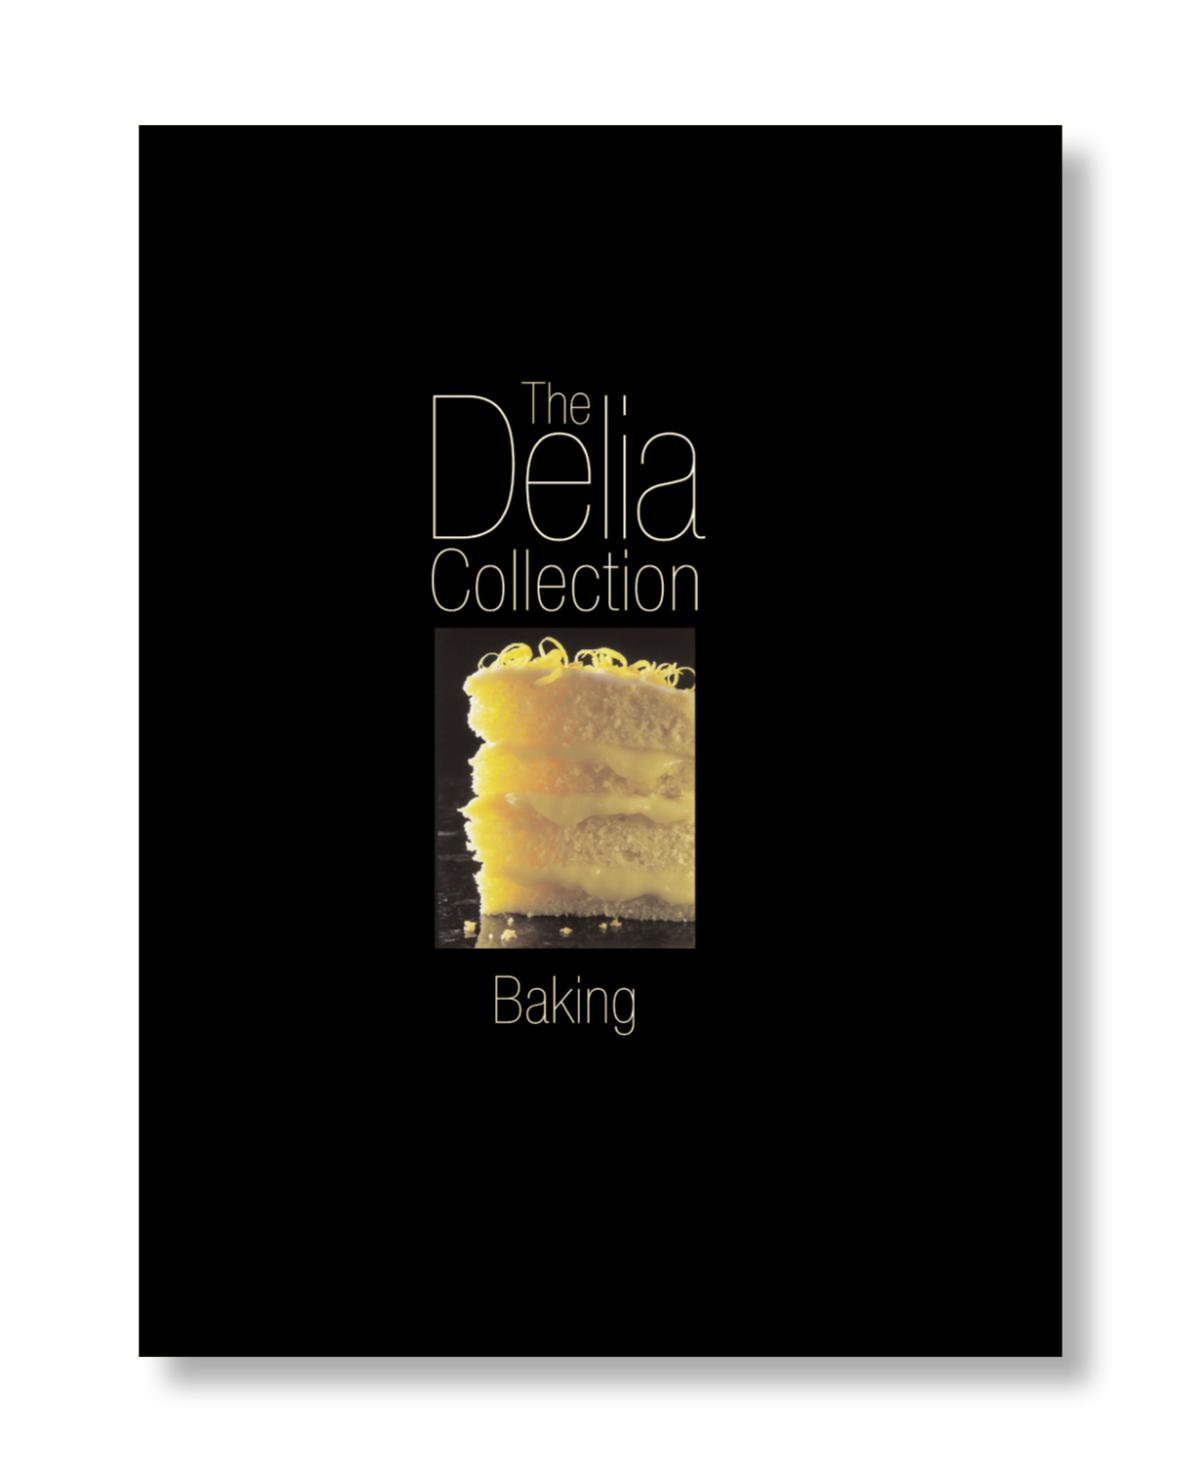 A picture of Delia's The Delia Collection: Baking recipes